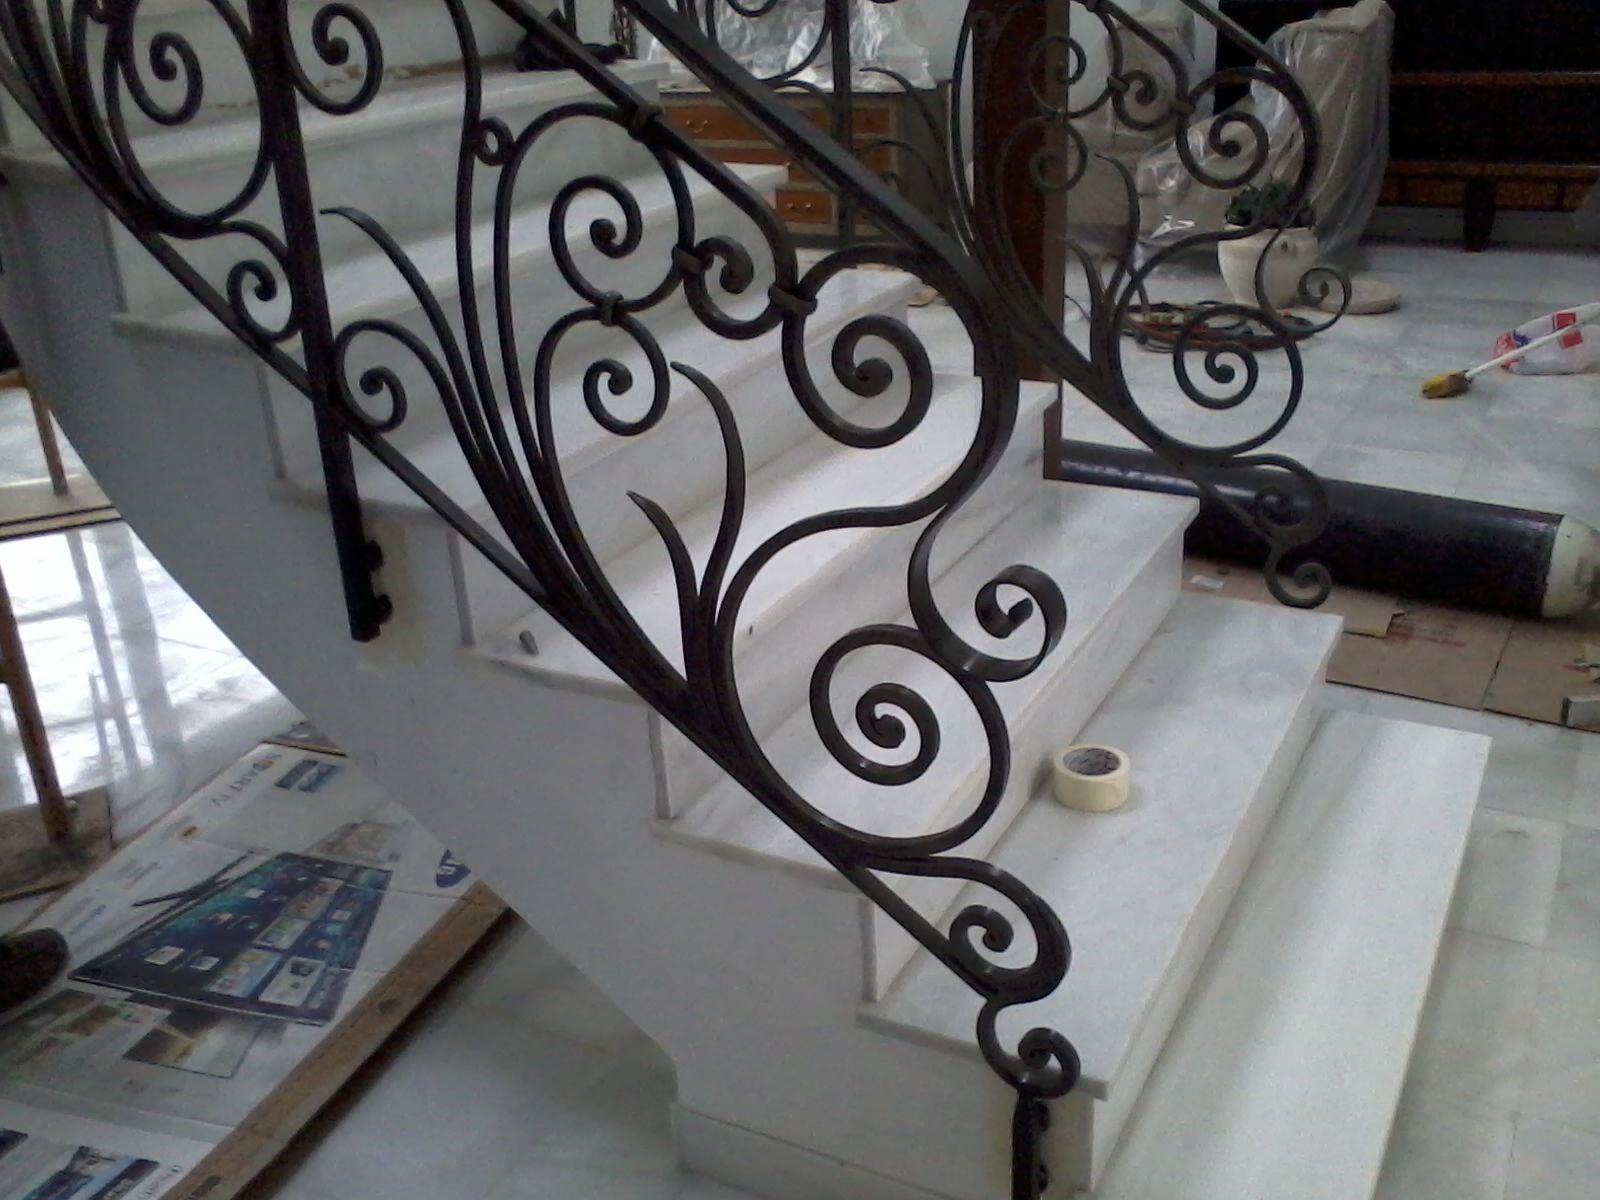 Arranque de escalera baranda de forja estilo imperial - Barandas de forja ...